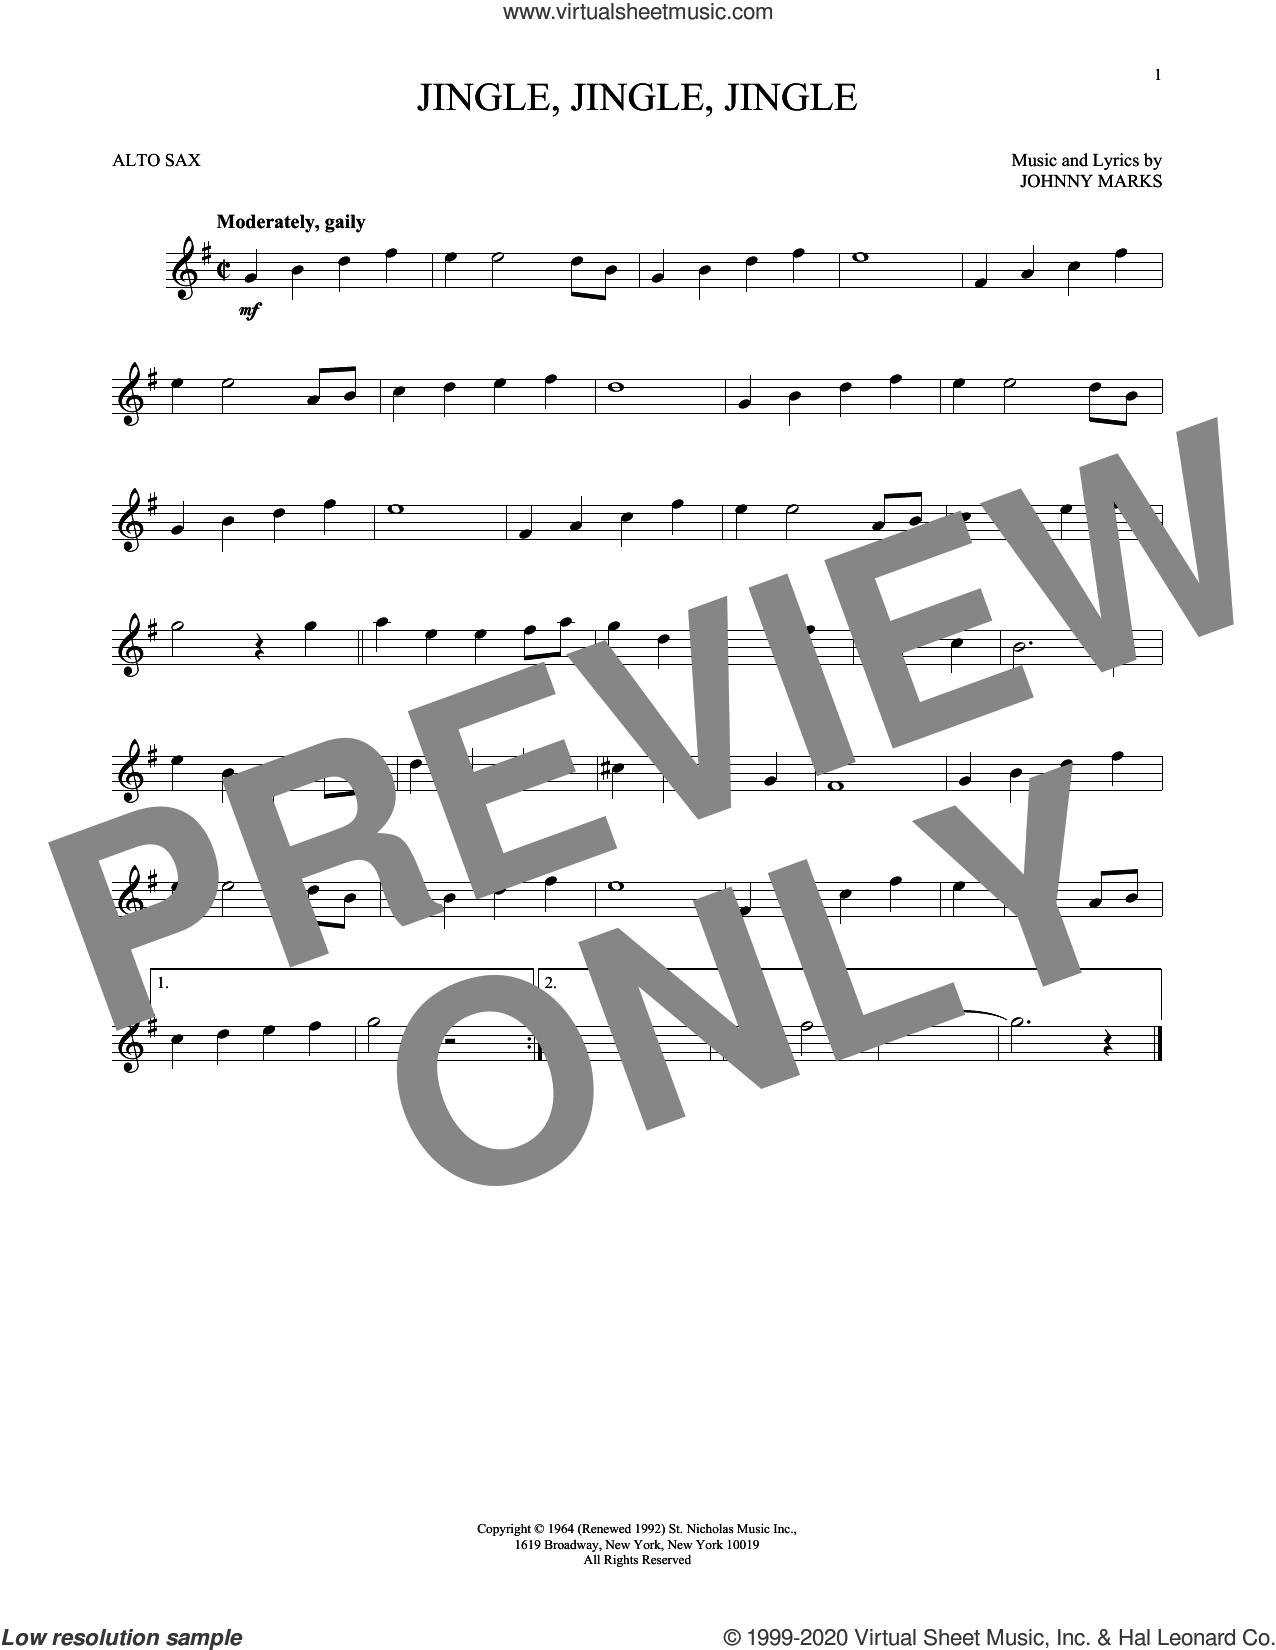 Jingle, Jingle, Jingle sheet music for alto saxophone solo by Johnny Marks, intermediate skill level